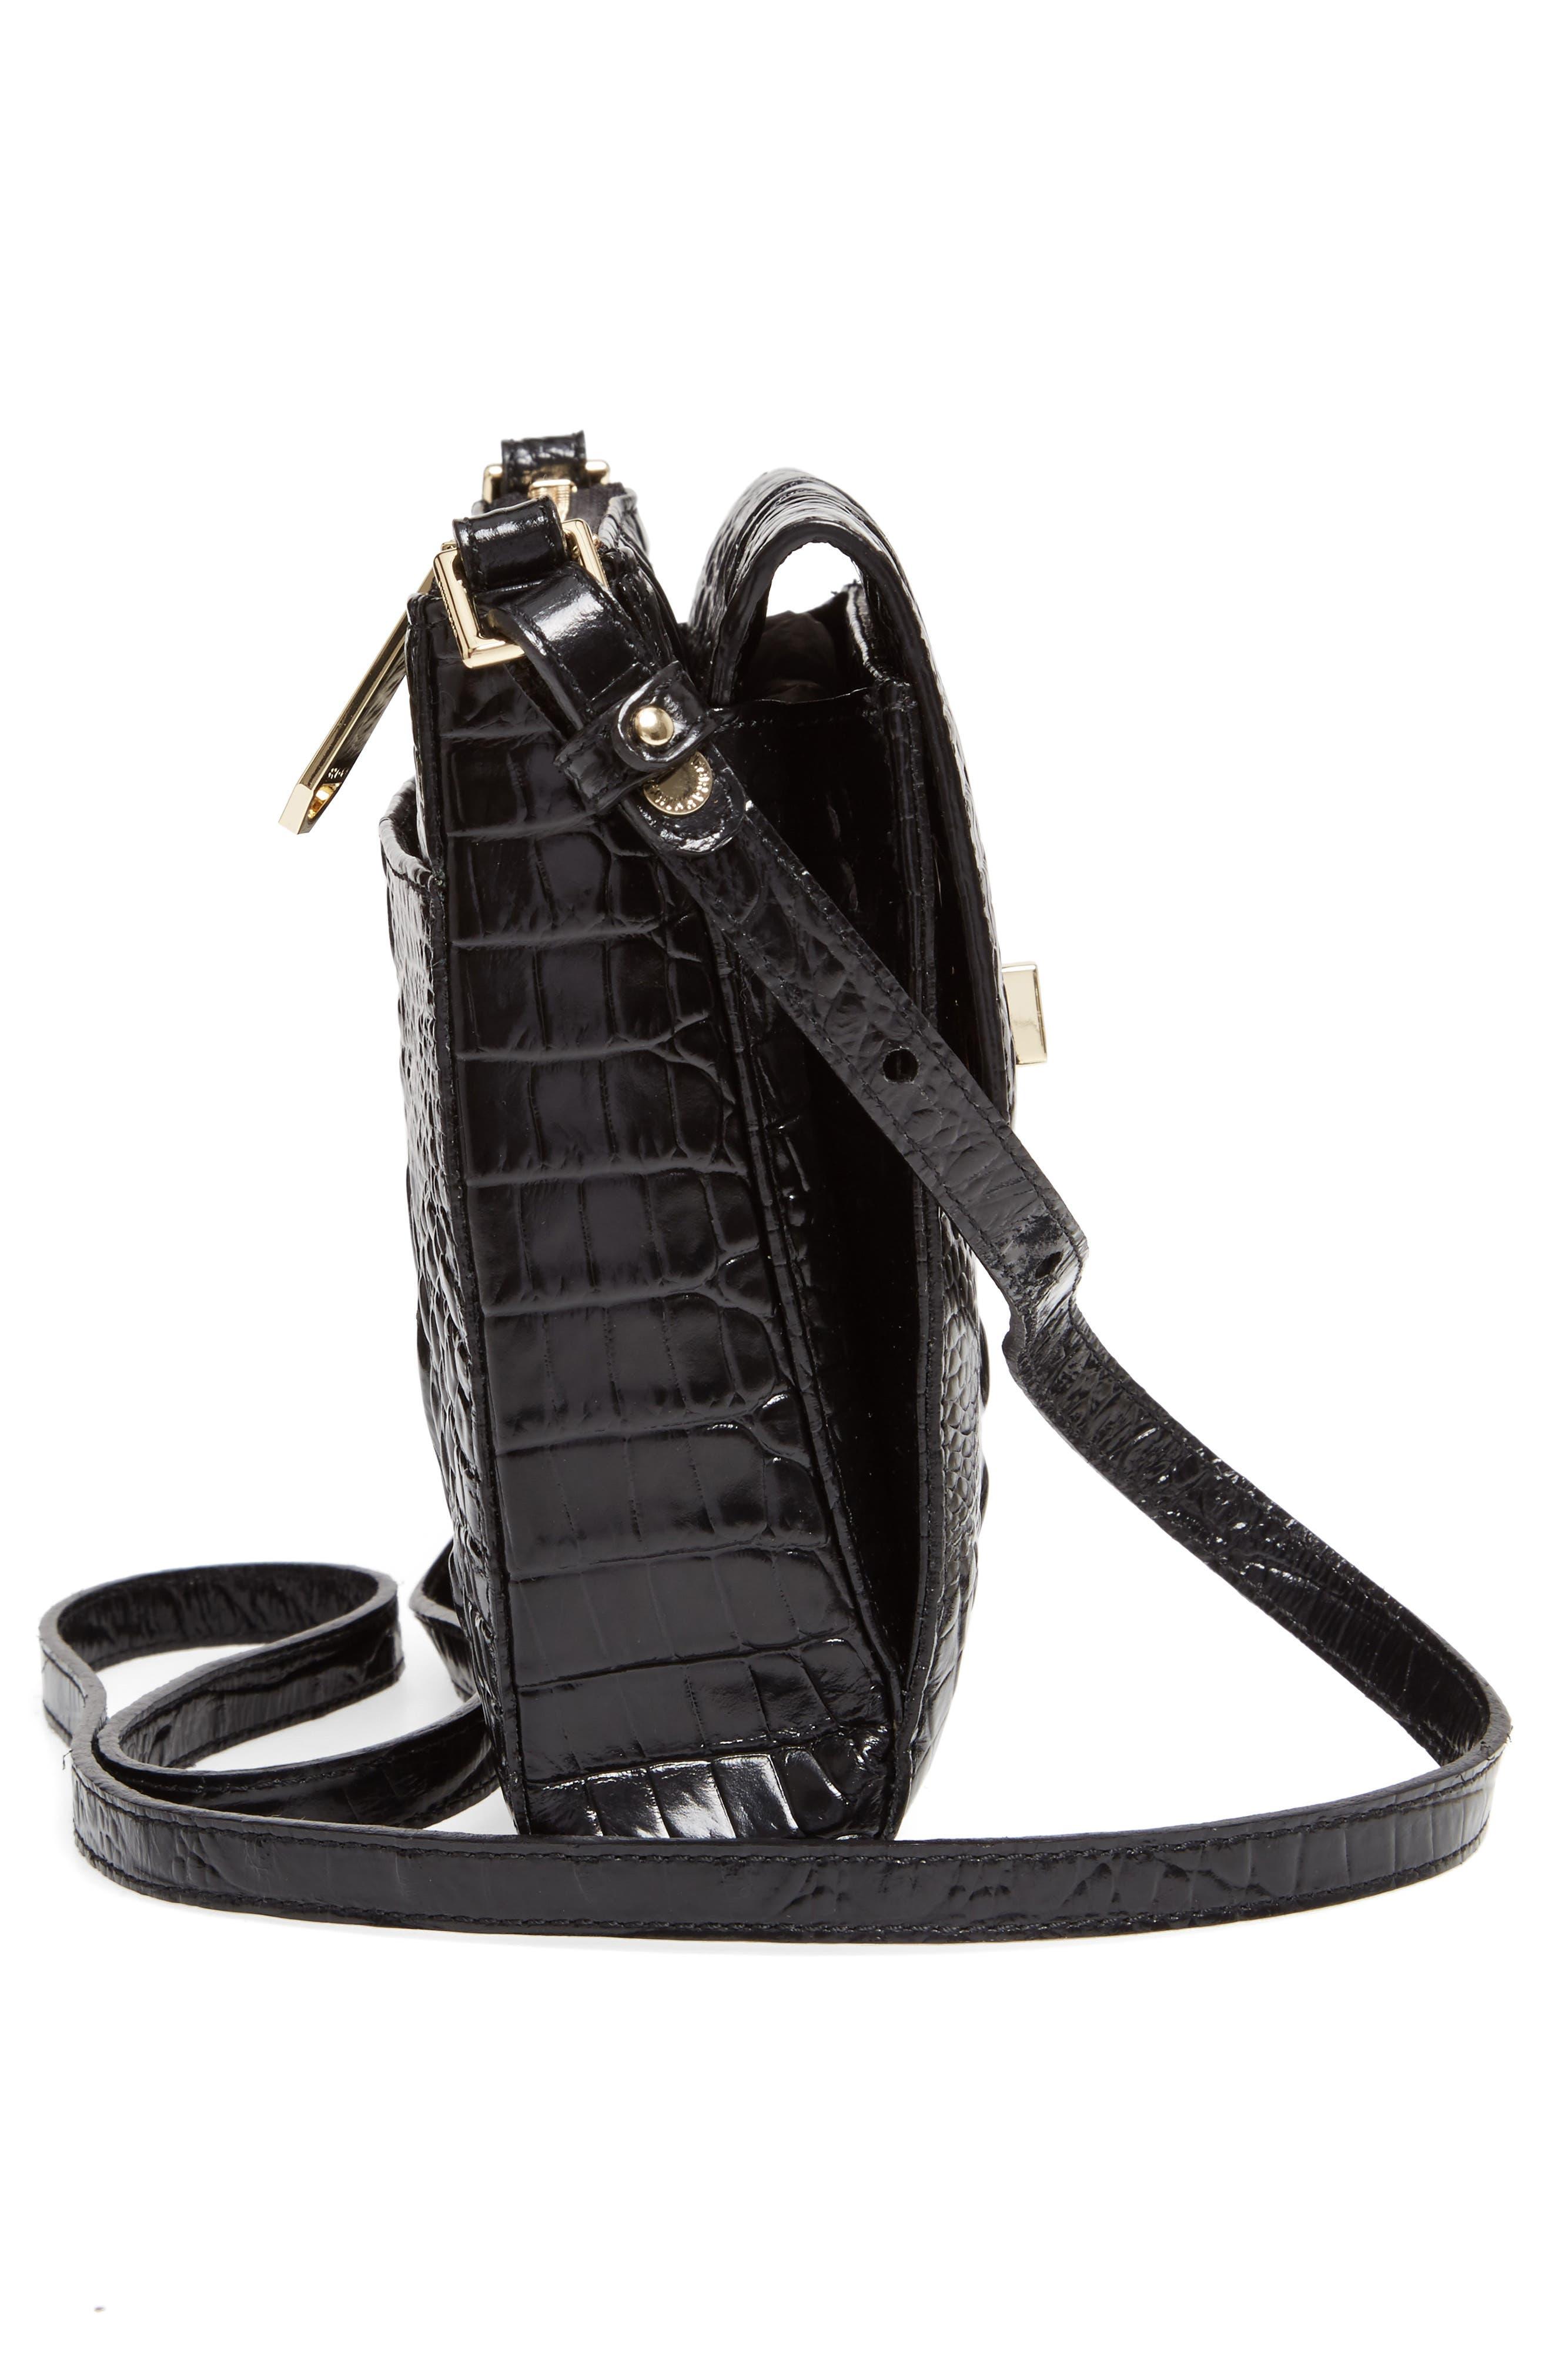 Melbourne Manhattan Croc Embossed Leather Crossbody Bag,                             Alternate thumbnail 5, color,                             BLACK